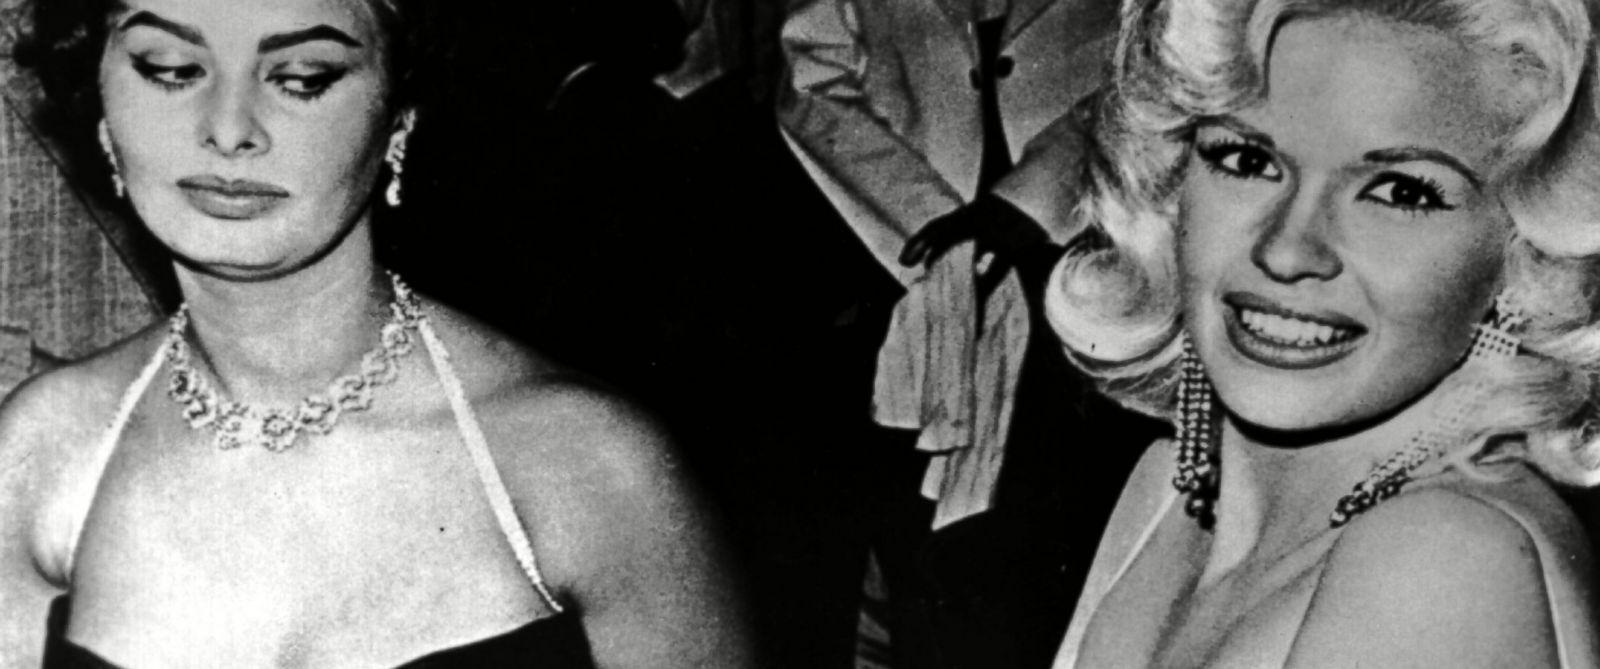 PHOTO: Sophia Loren eyes Jayne Mansfield 57 years ago at a Paramount party.